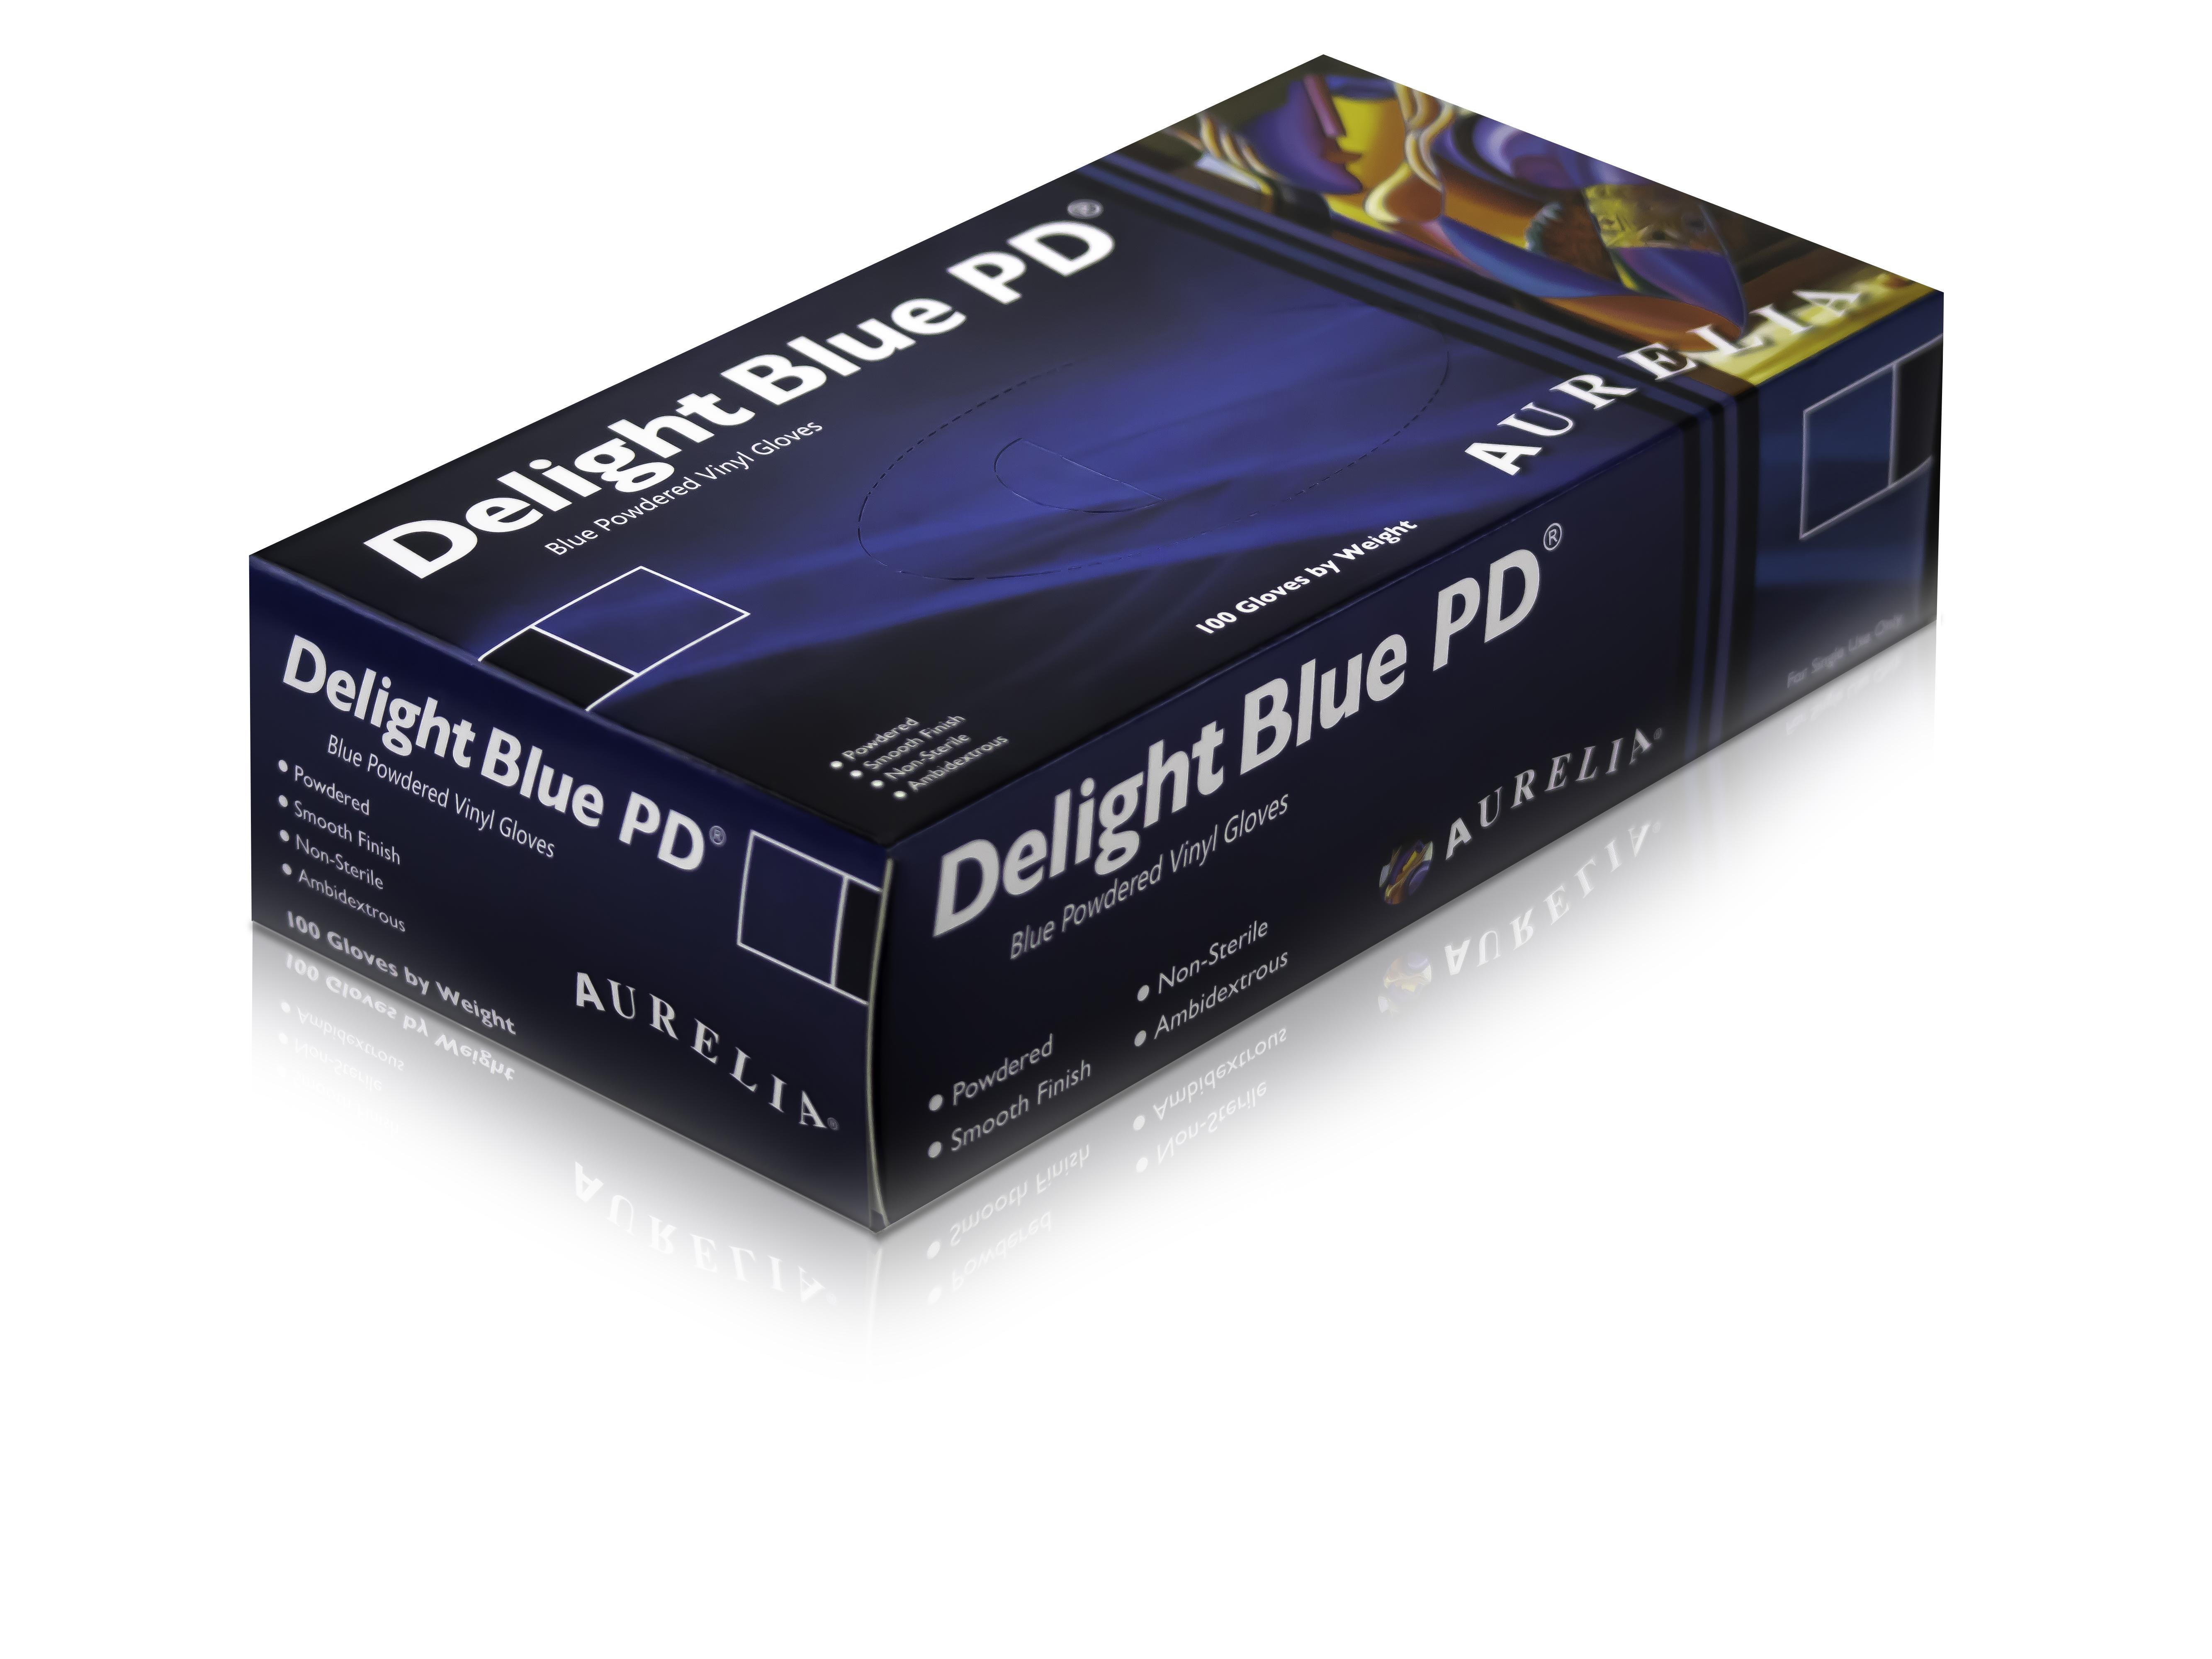 Delight Blue PD®